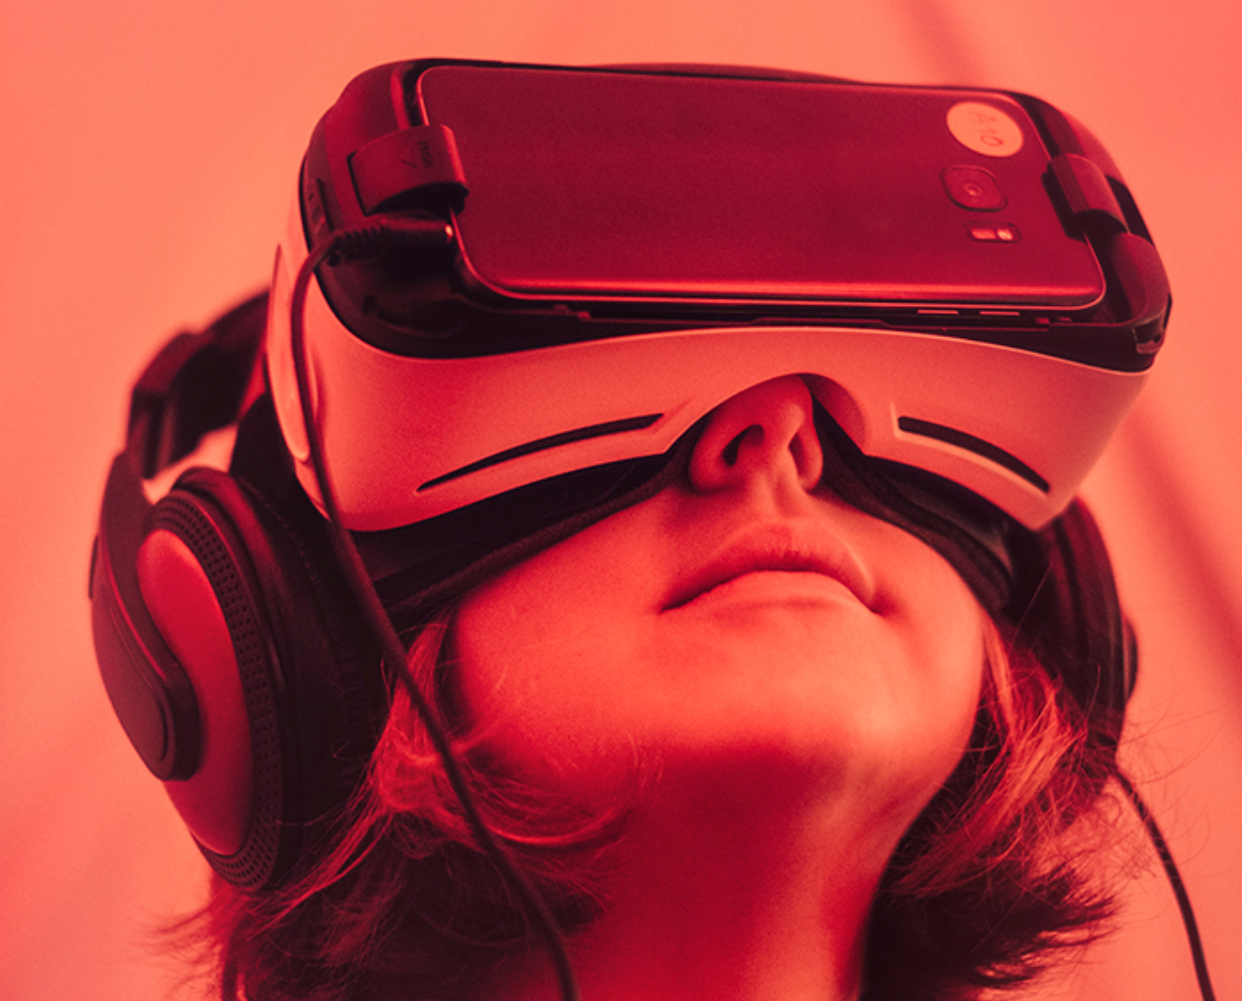 Girl VR Image